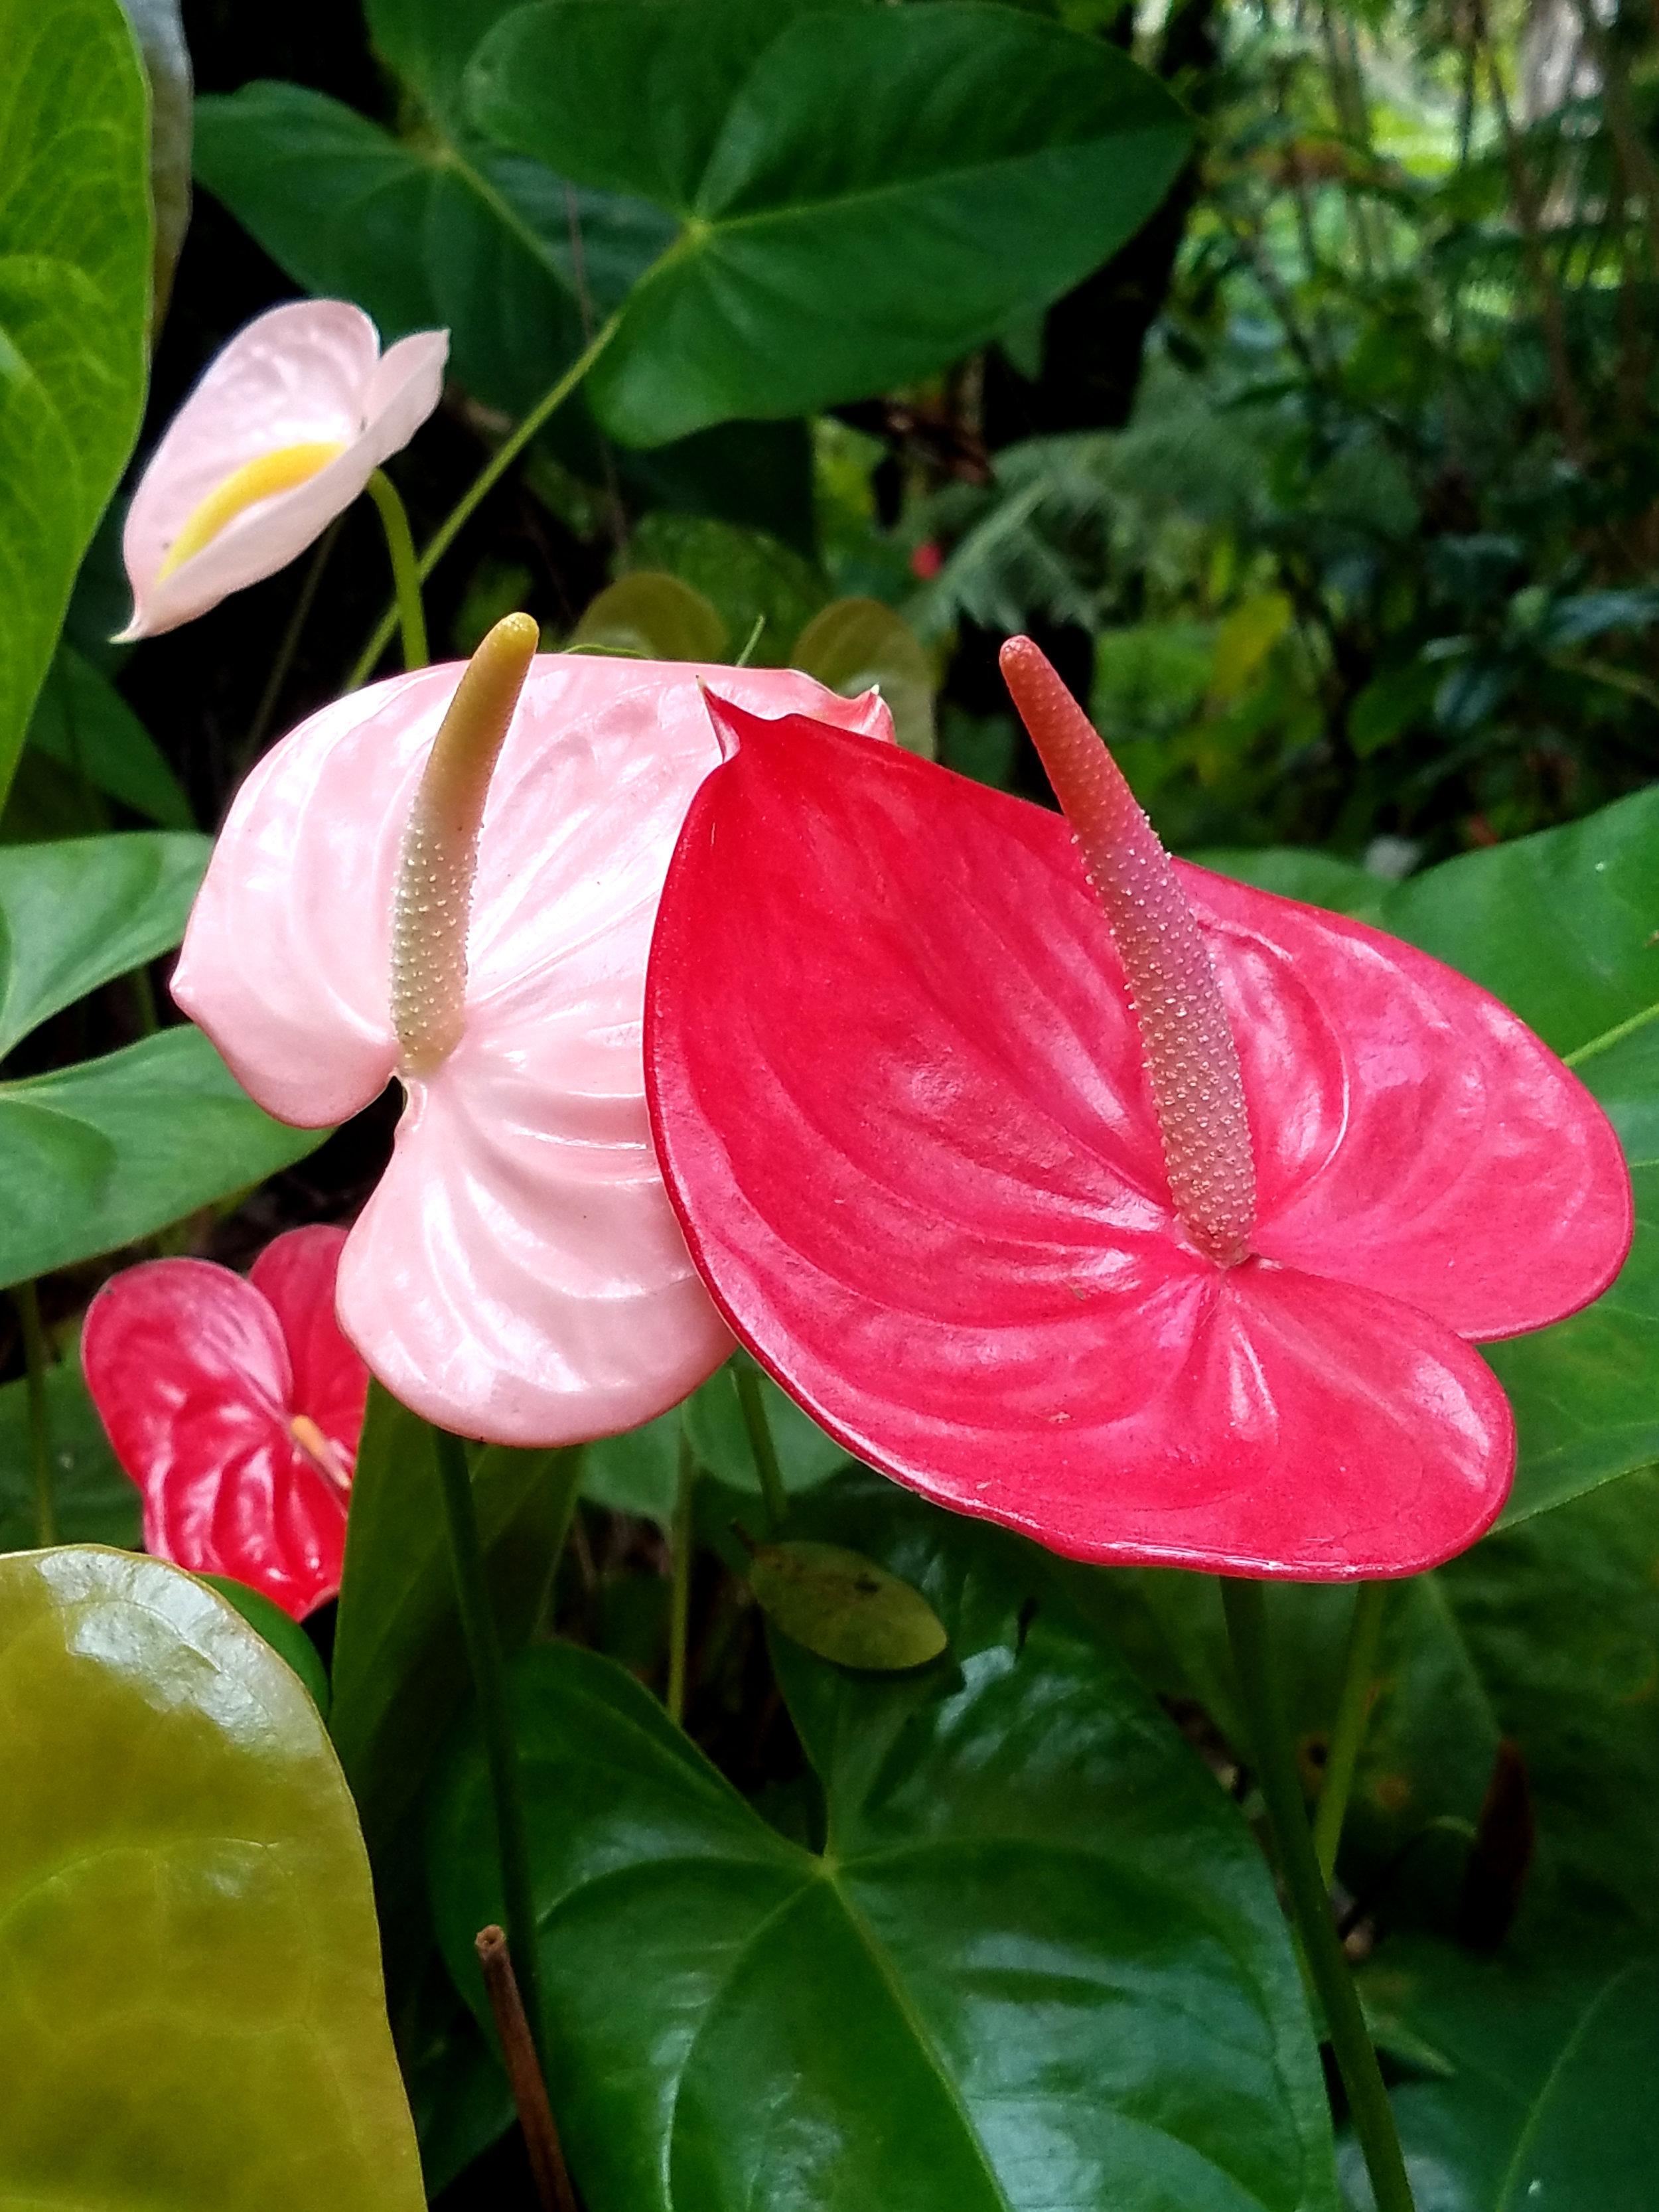 Abe Pink Anthurium growin g.jpg